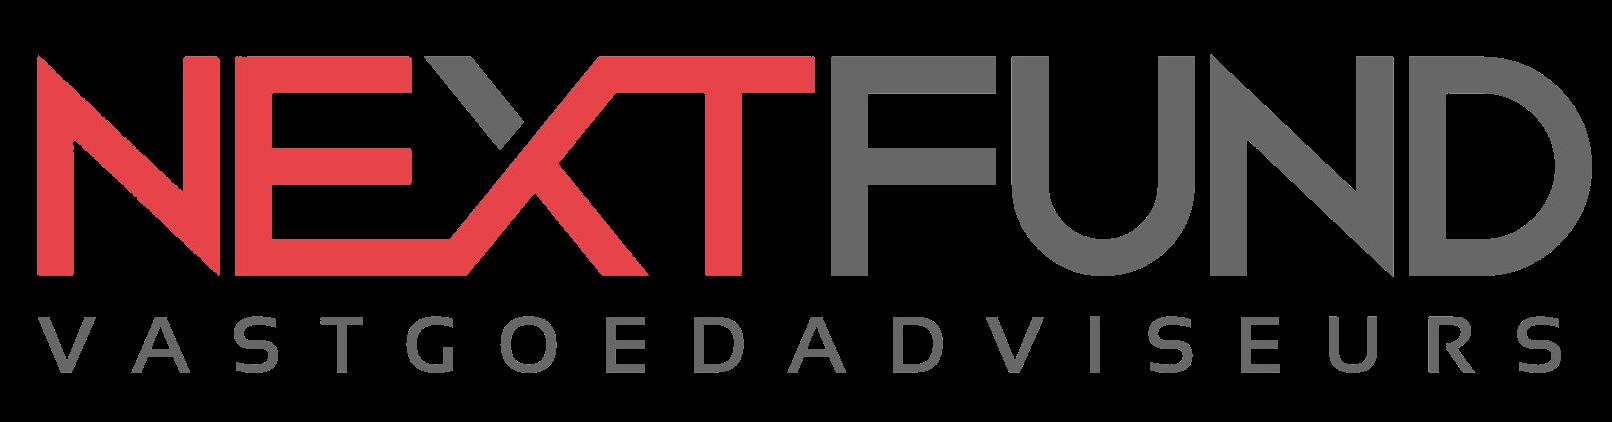 Nextfund Vastgoedadviseurs